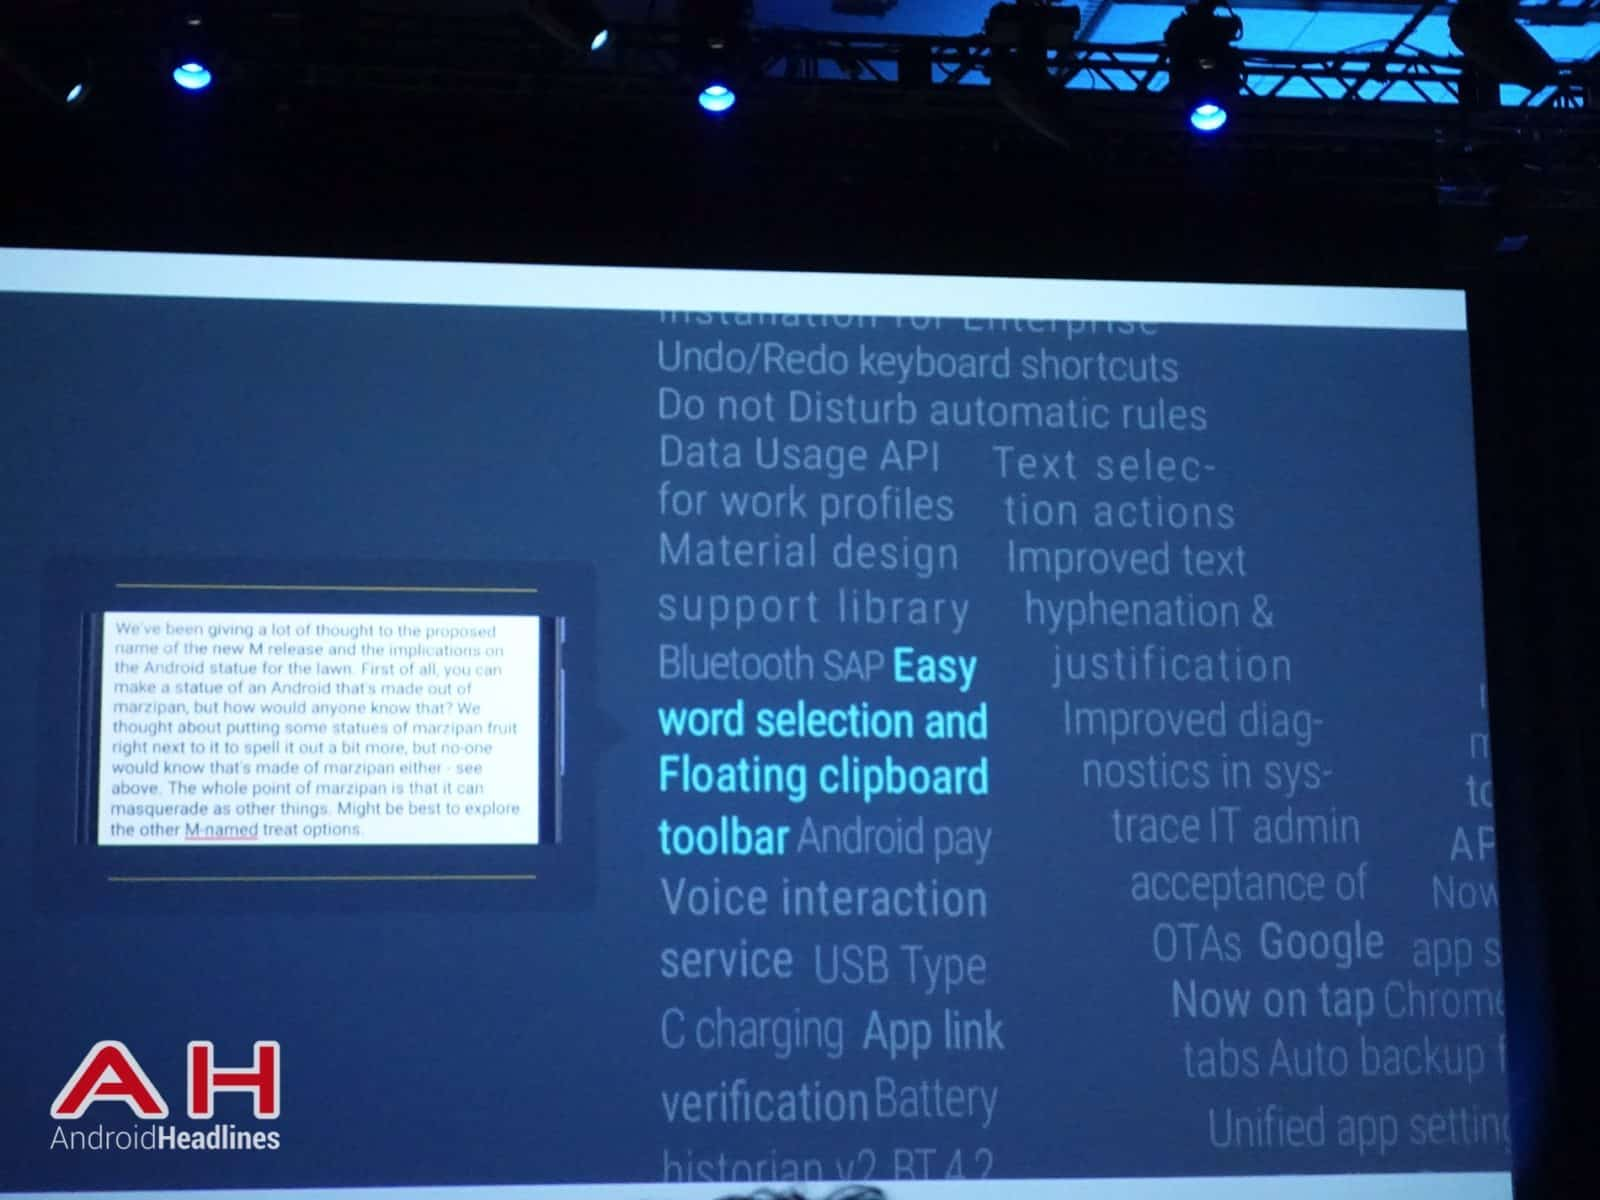 Google IO 15 Keynote AH 25